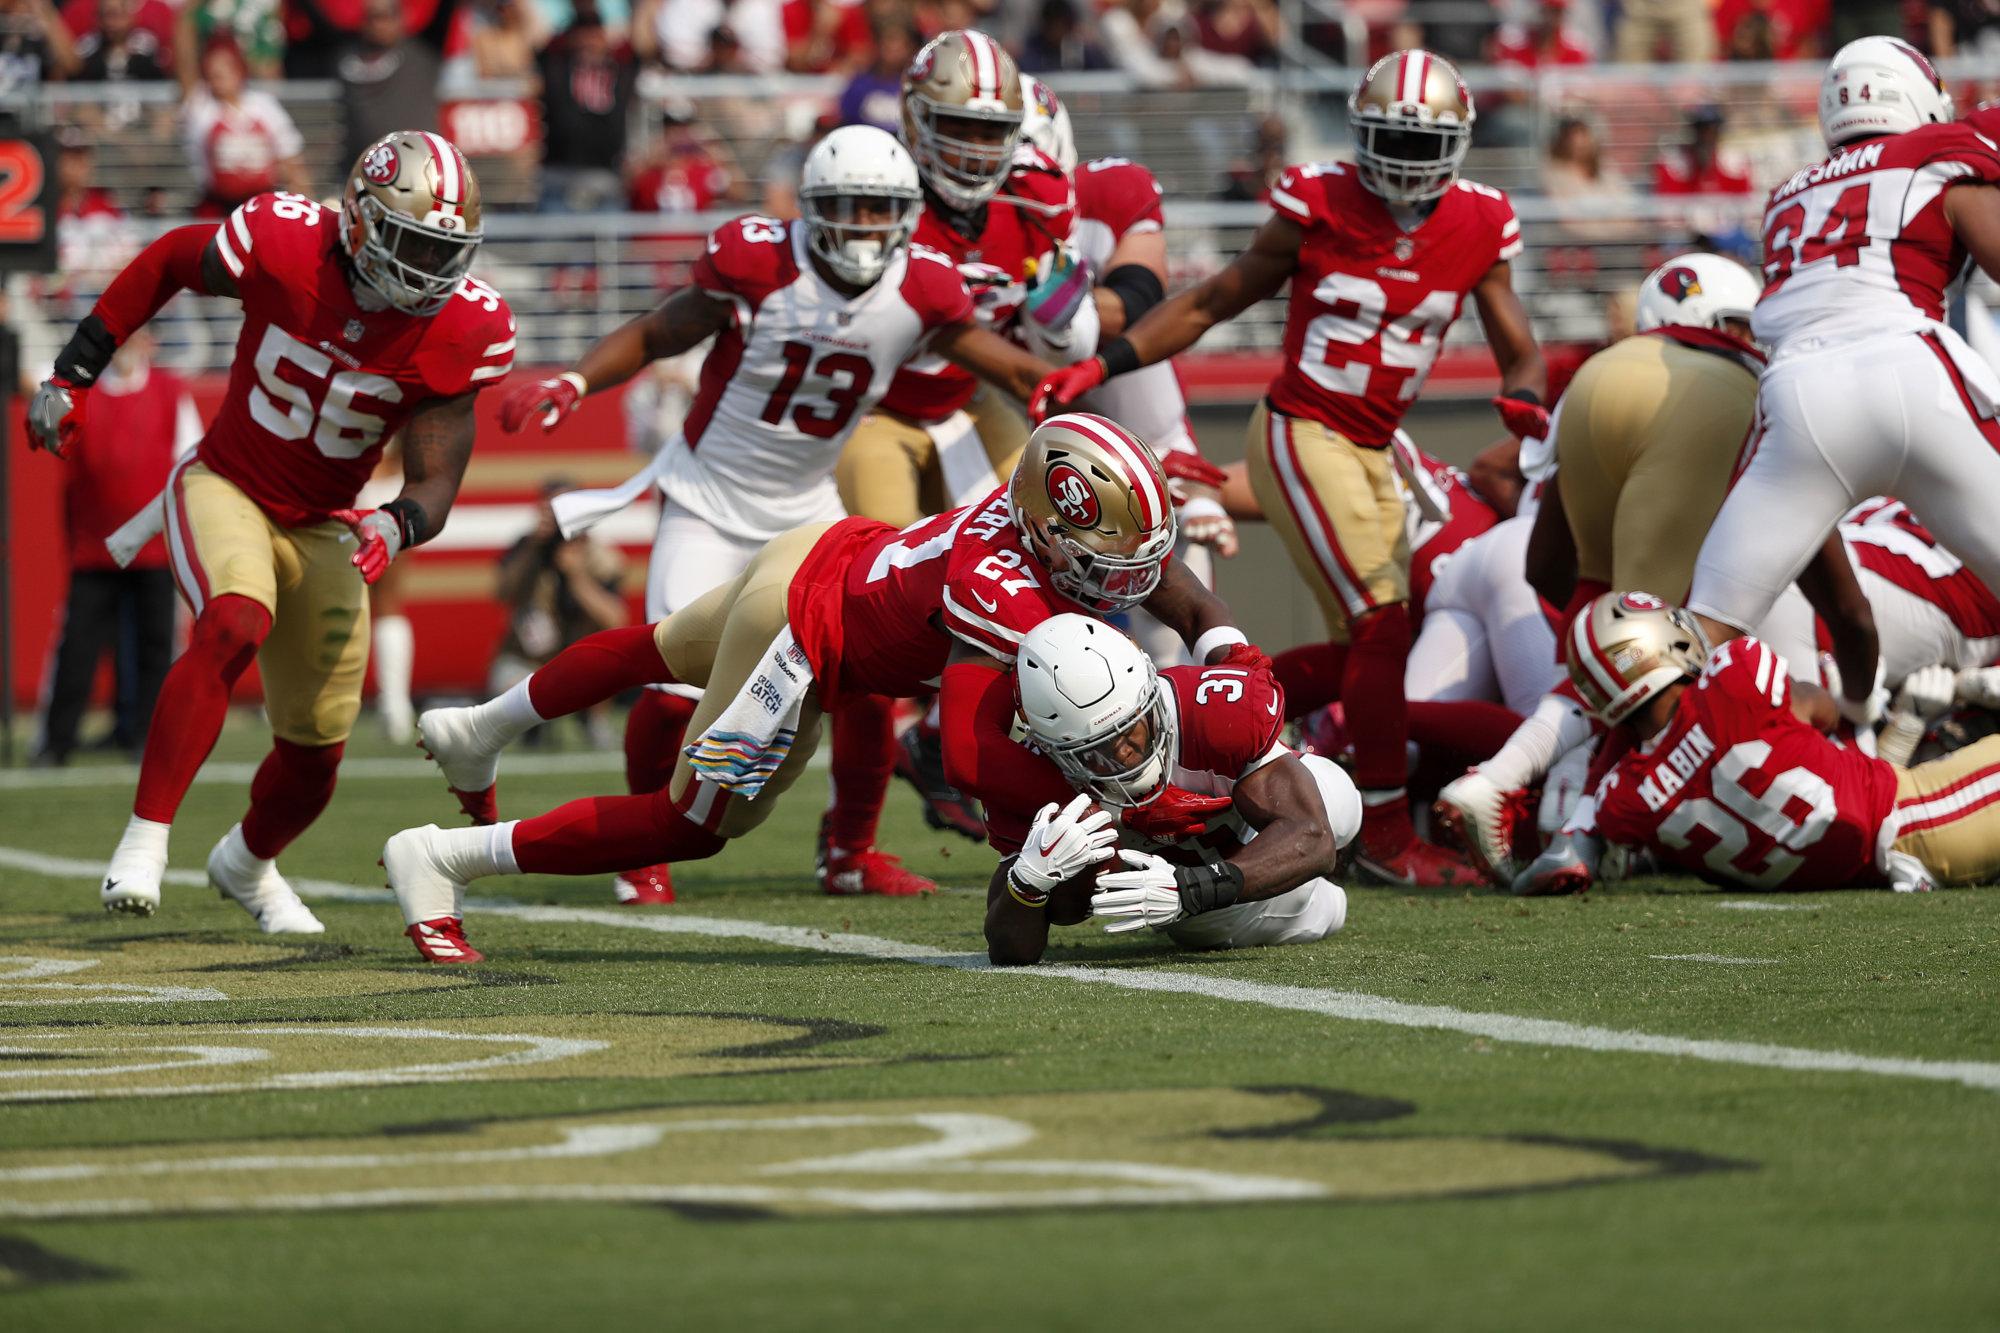 Arizona Cardinals running back David Johnson (31) scores a touchdown against San Francisco 49ers defensive back Adrian Colbert (27) during the first half of an NFL football game in Santa Clara, Calif., Sunday, Oct. 7, 2018. (AP Photo/Tony Avelar)